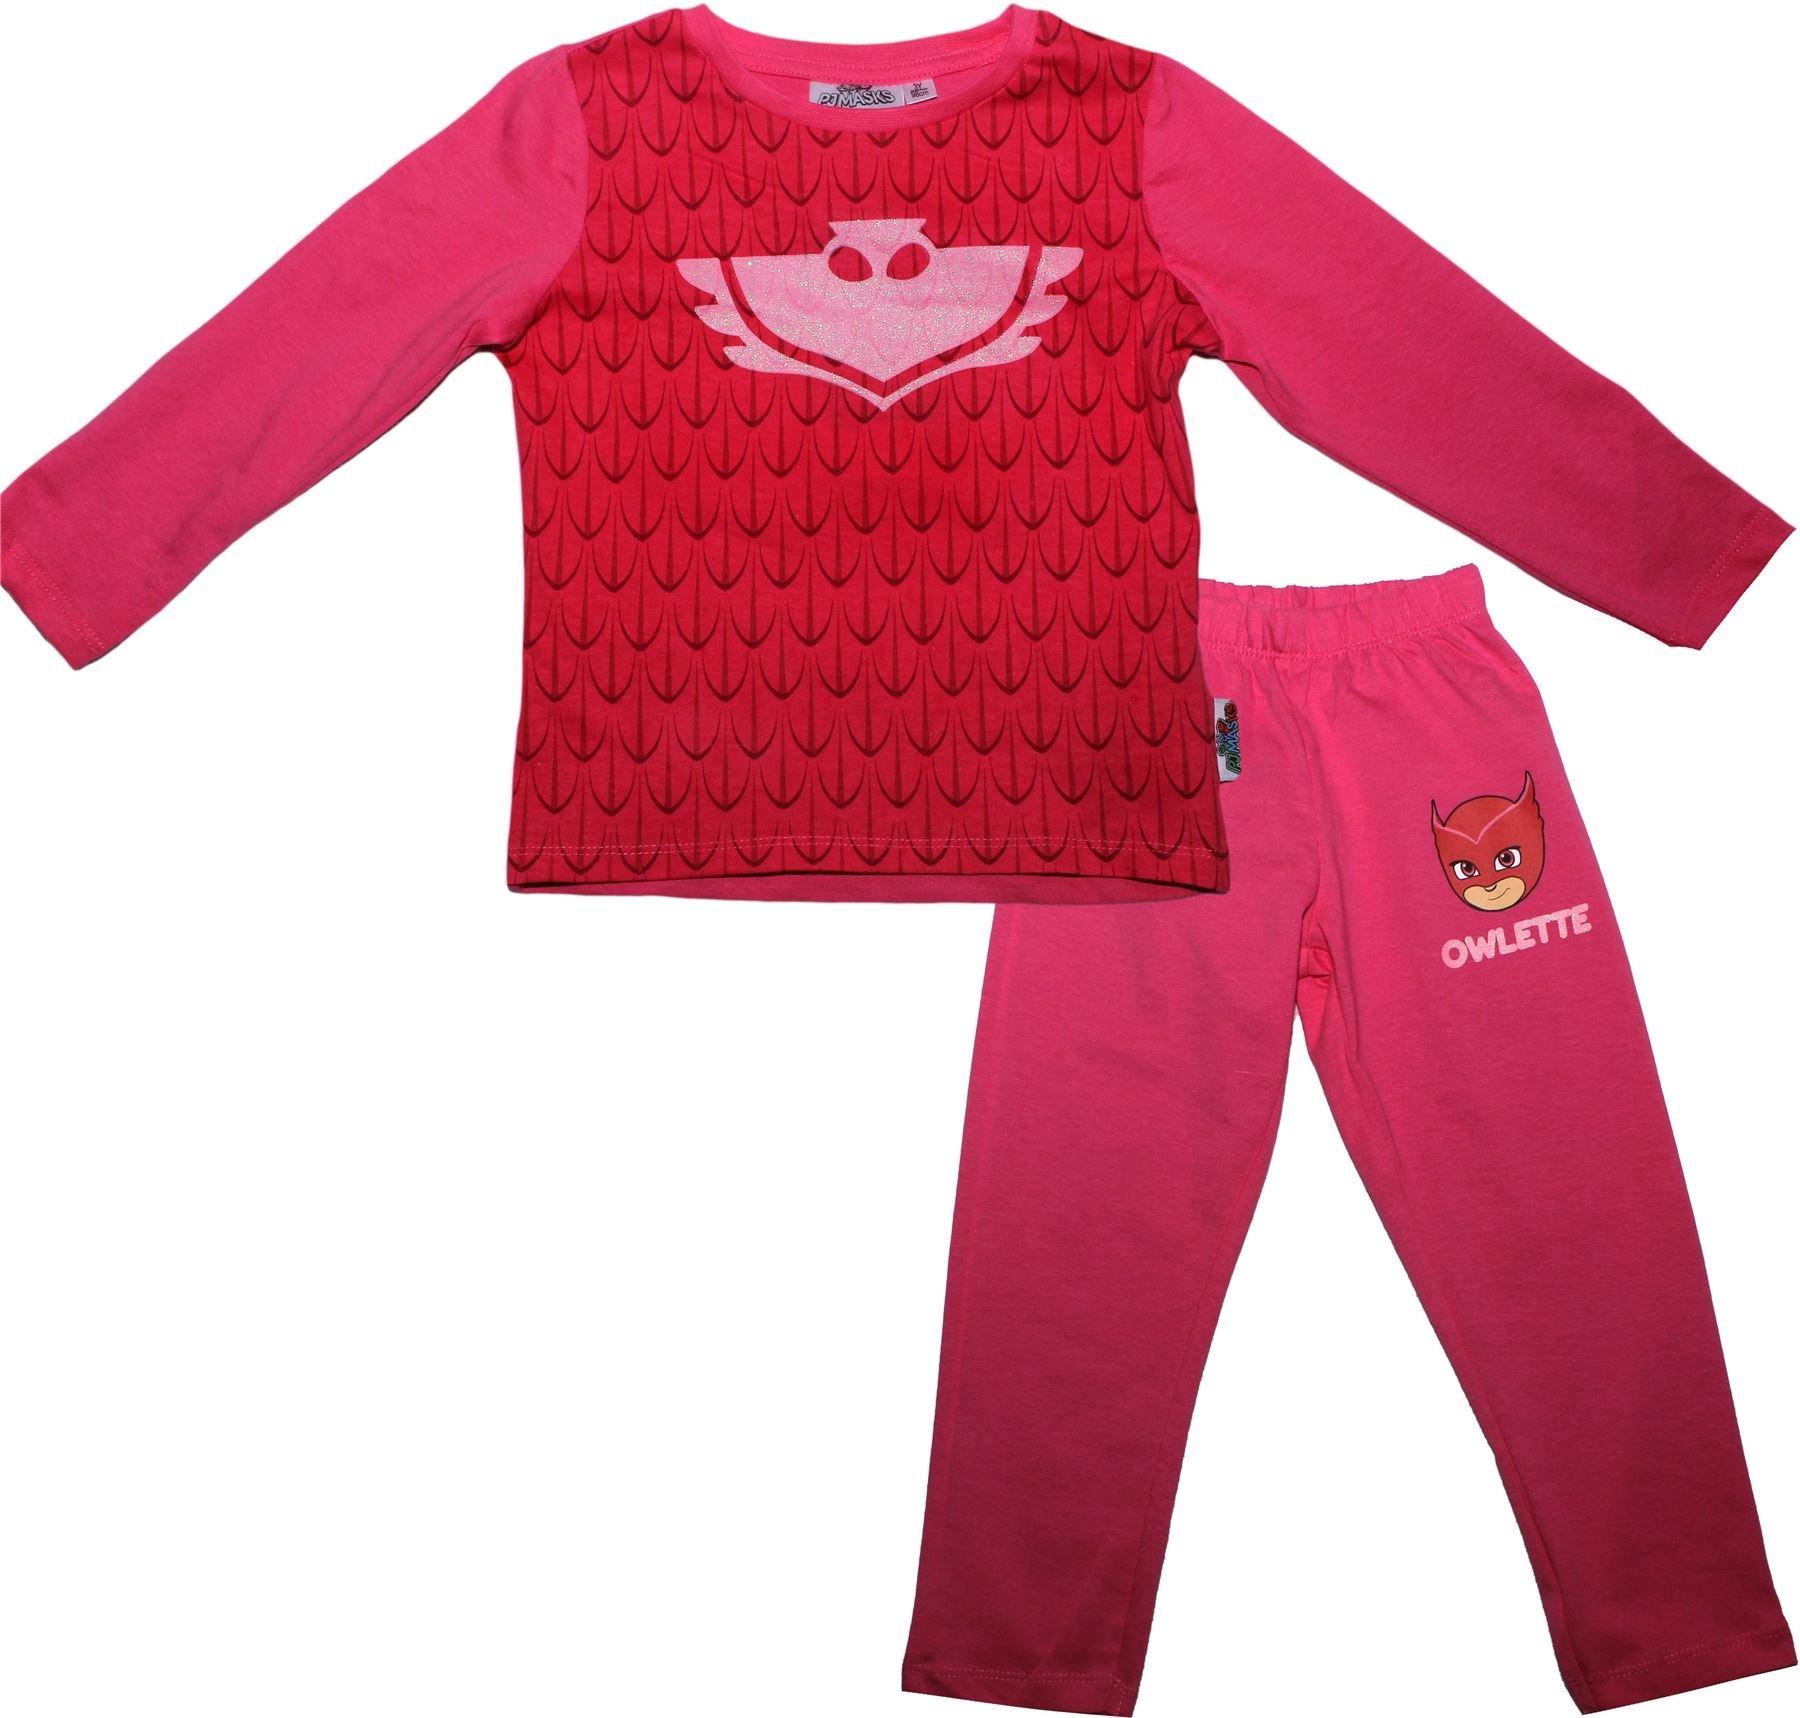 Carters Little Girls 2 Piece Fleece Fairisle Pj Set 4 Kids, Navy0